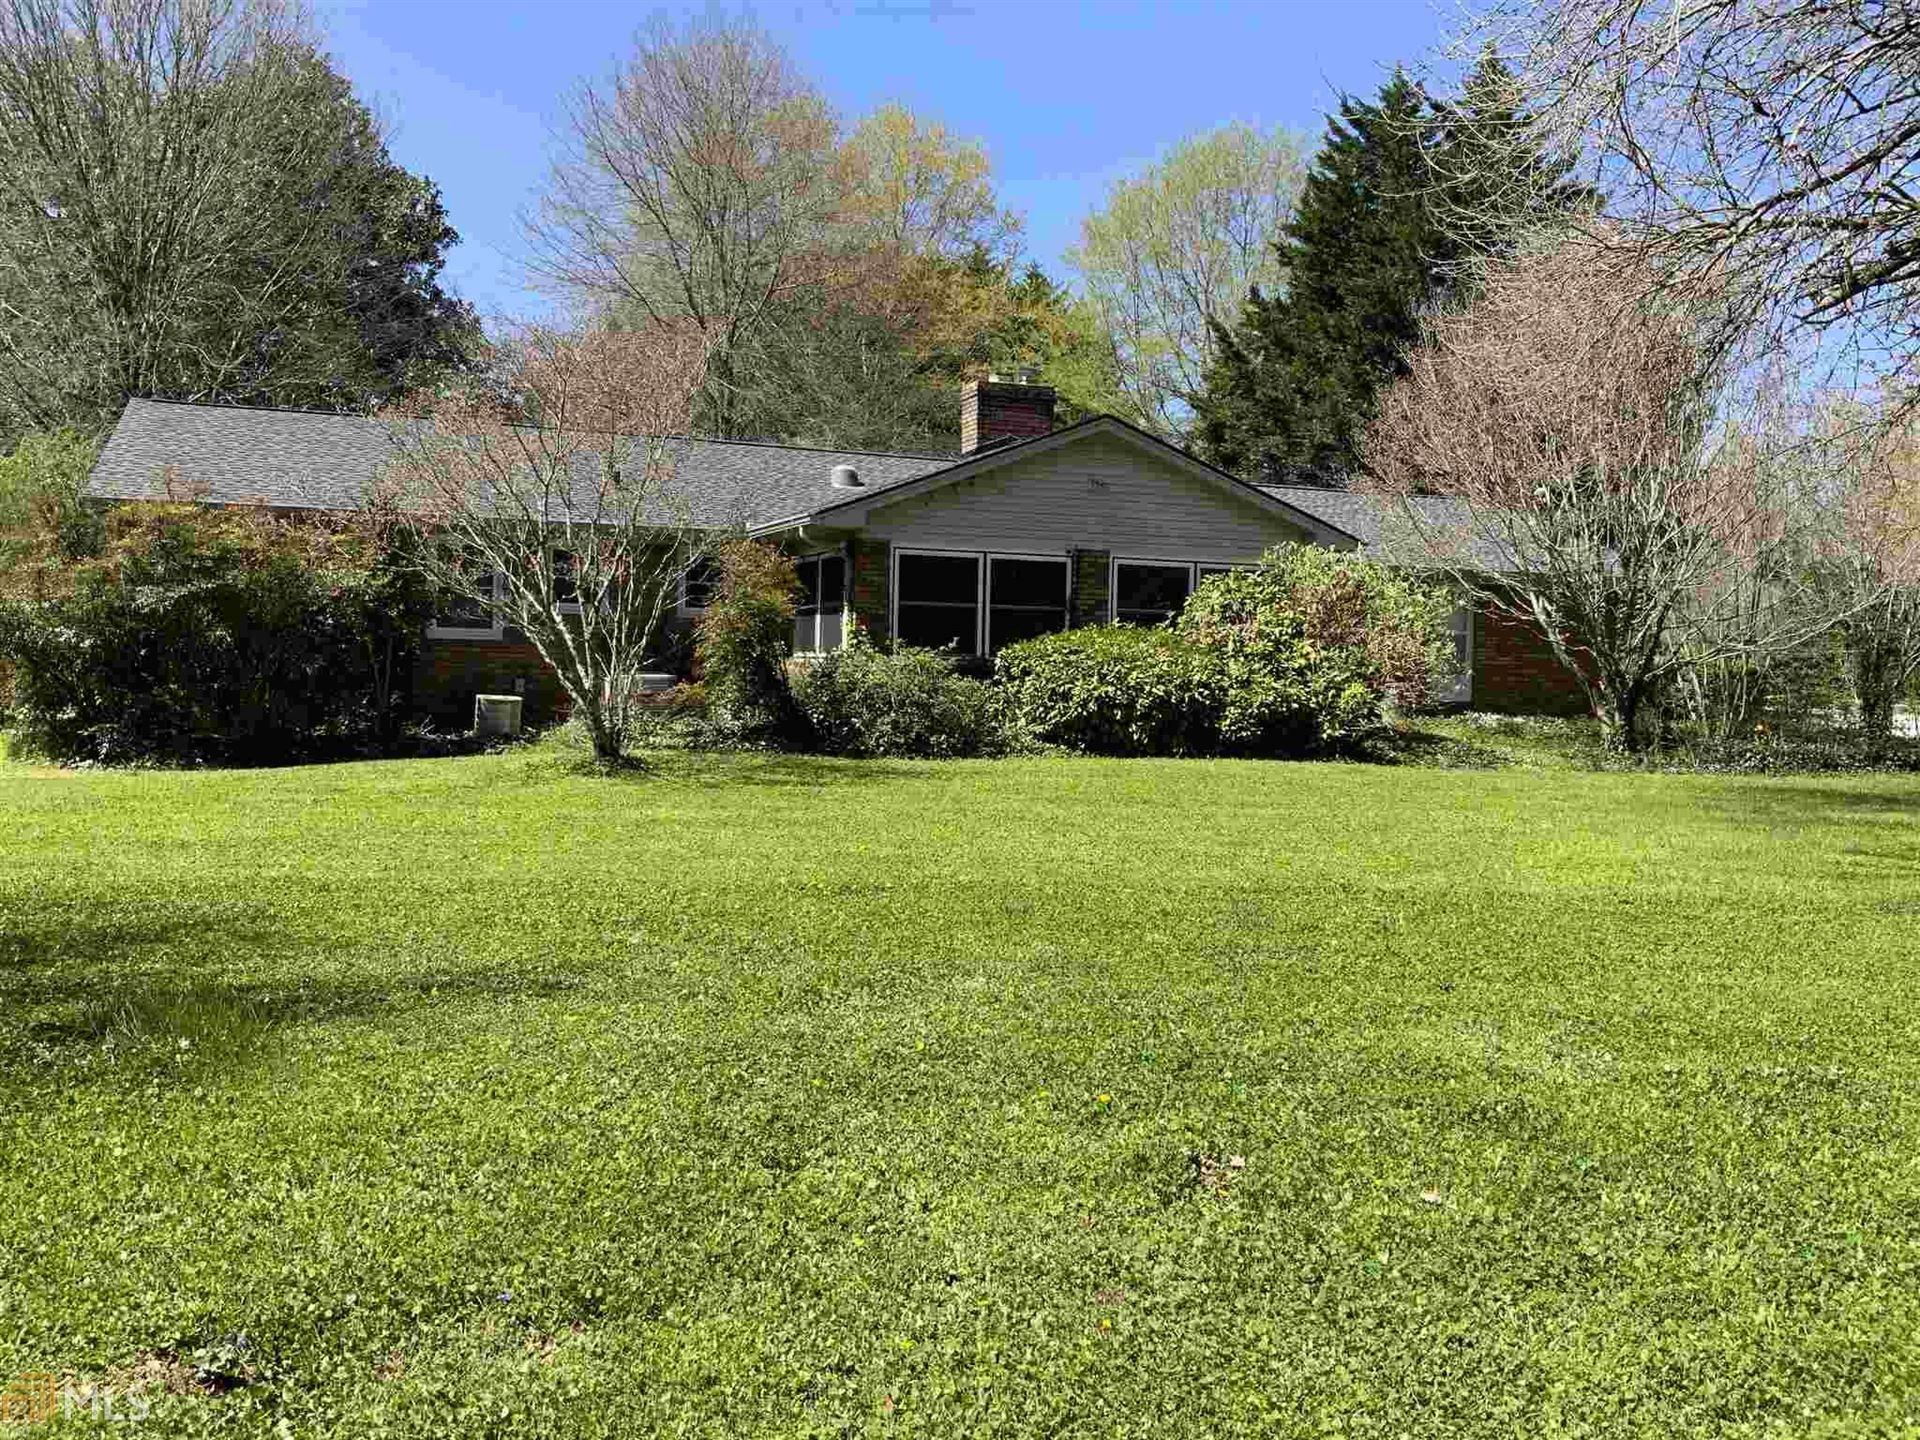 416 Lakeview Hts, Cornelia, GA 30531 - #: 8956661